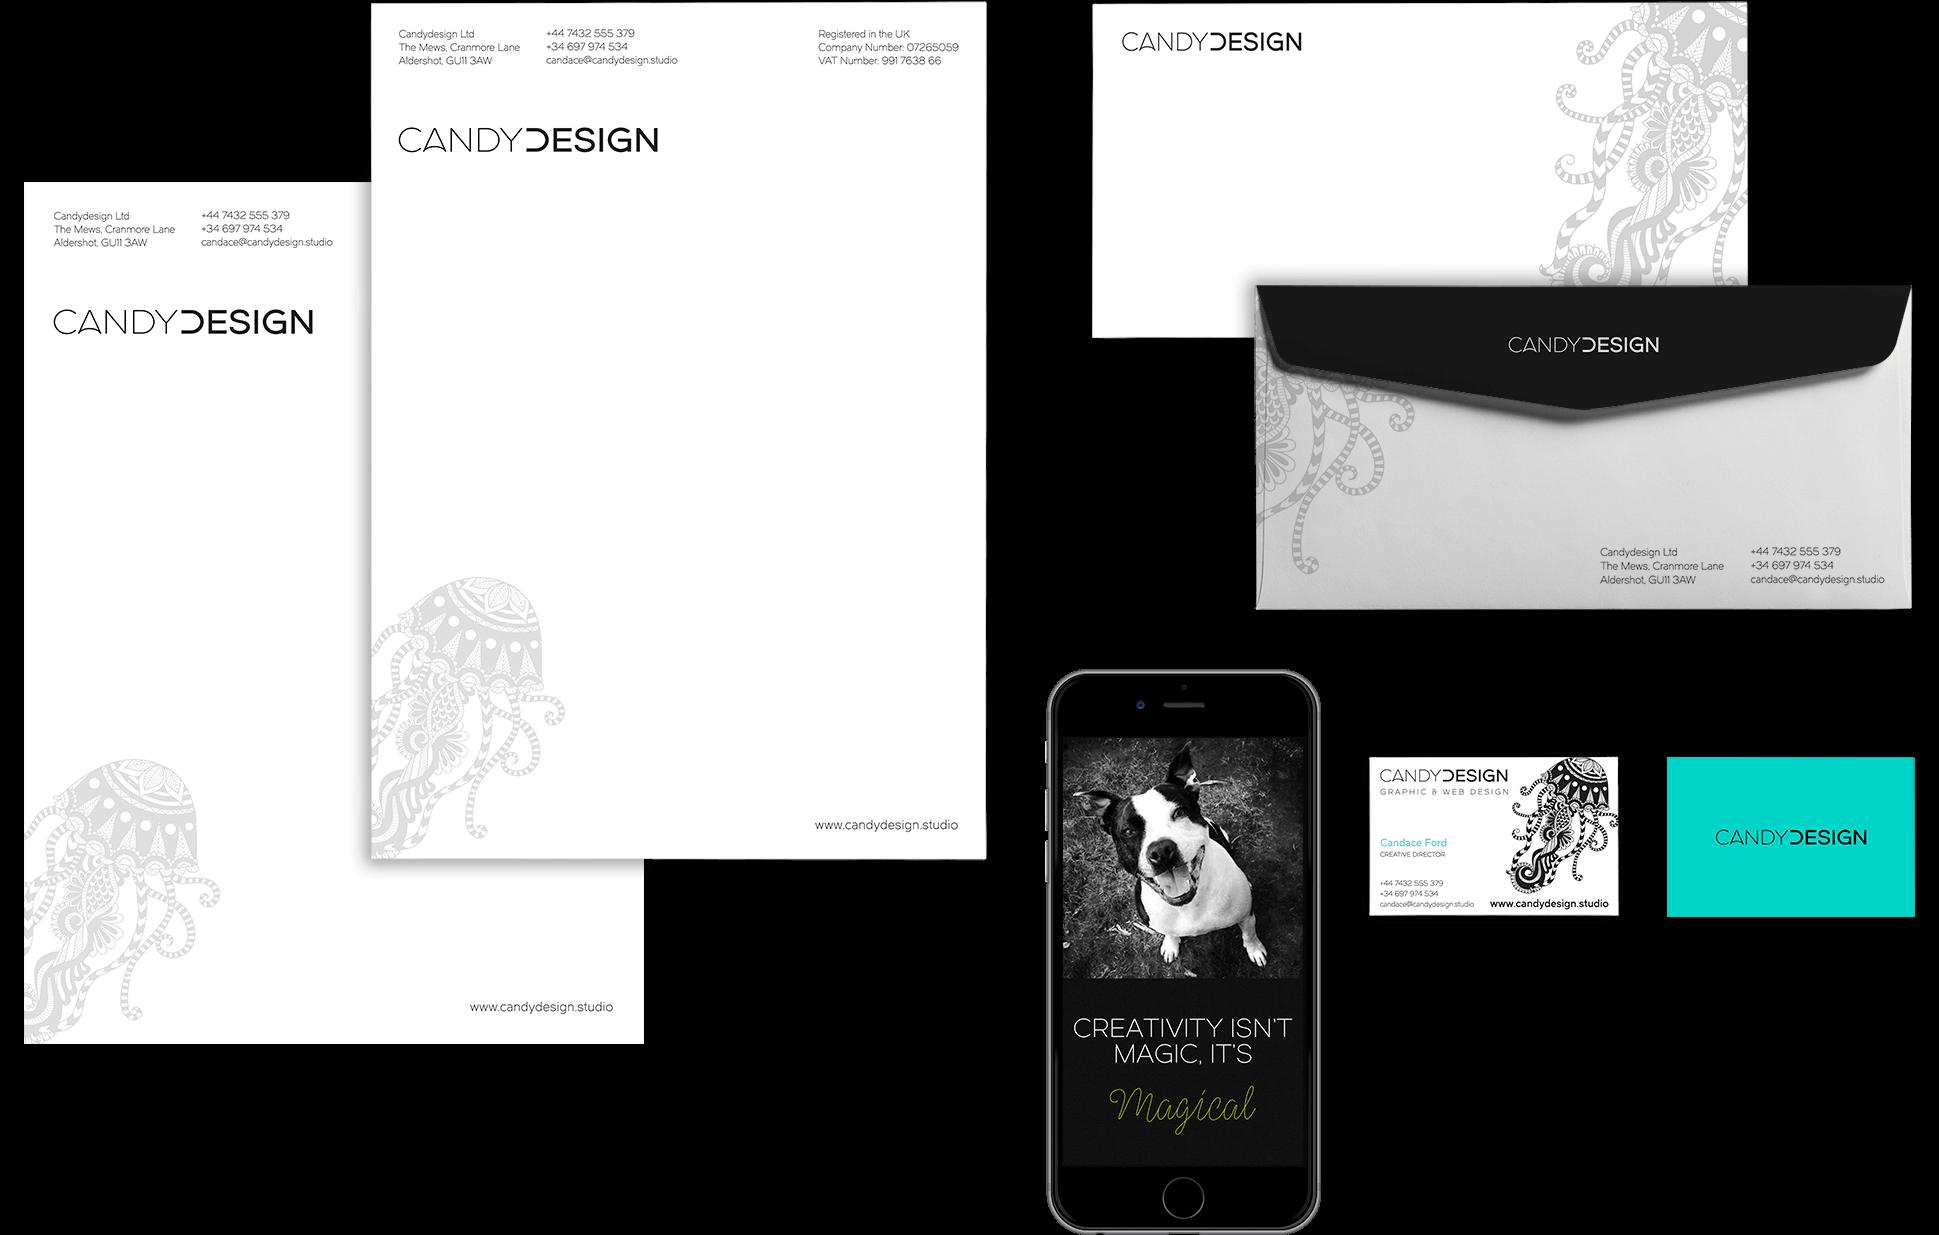 Candydesign Branding